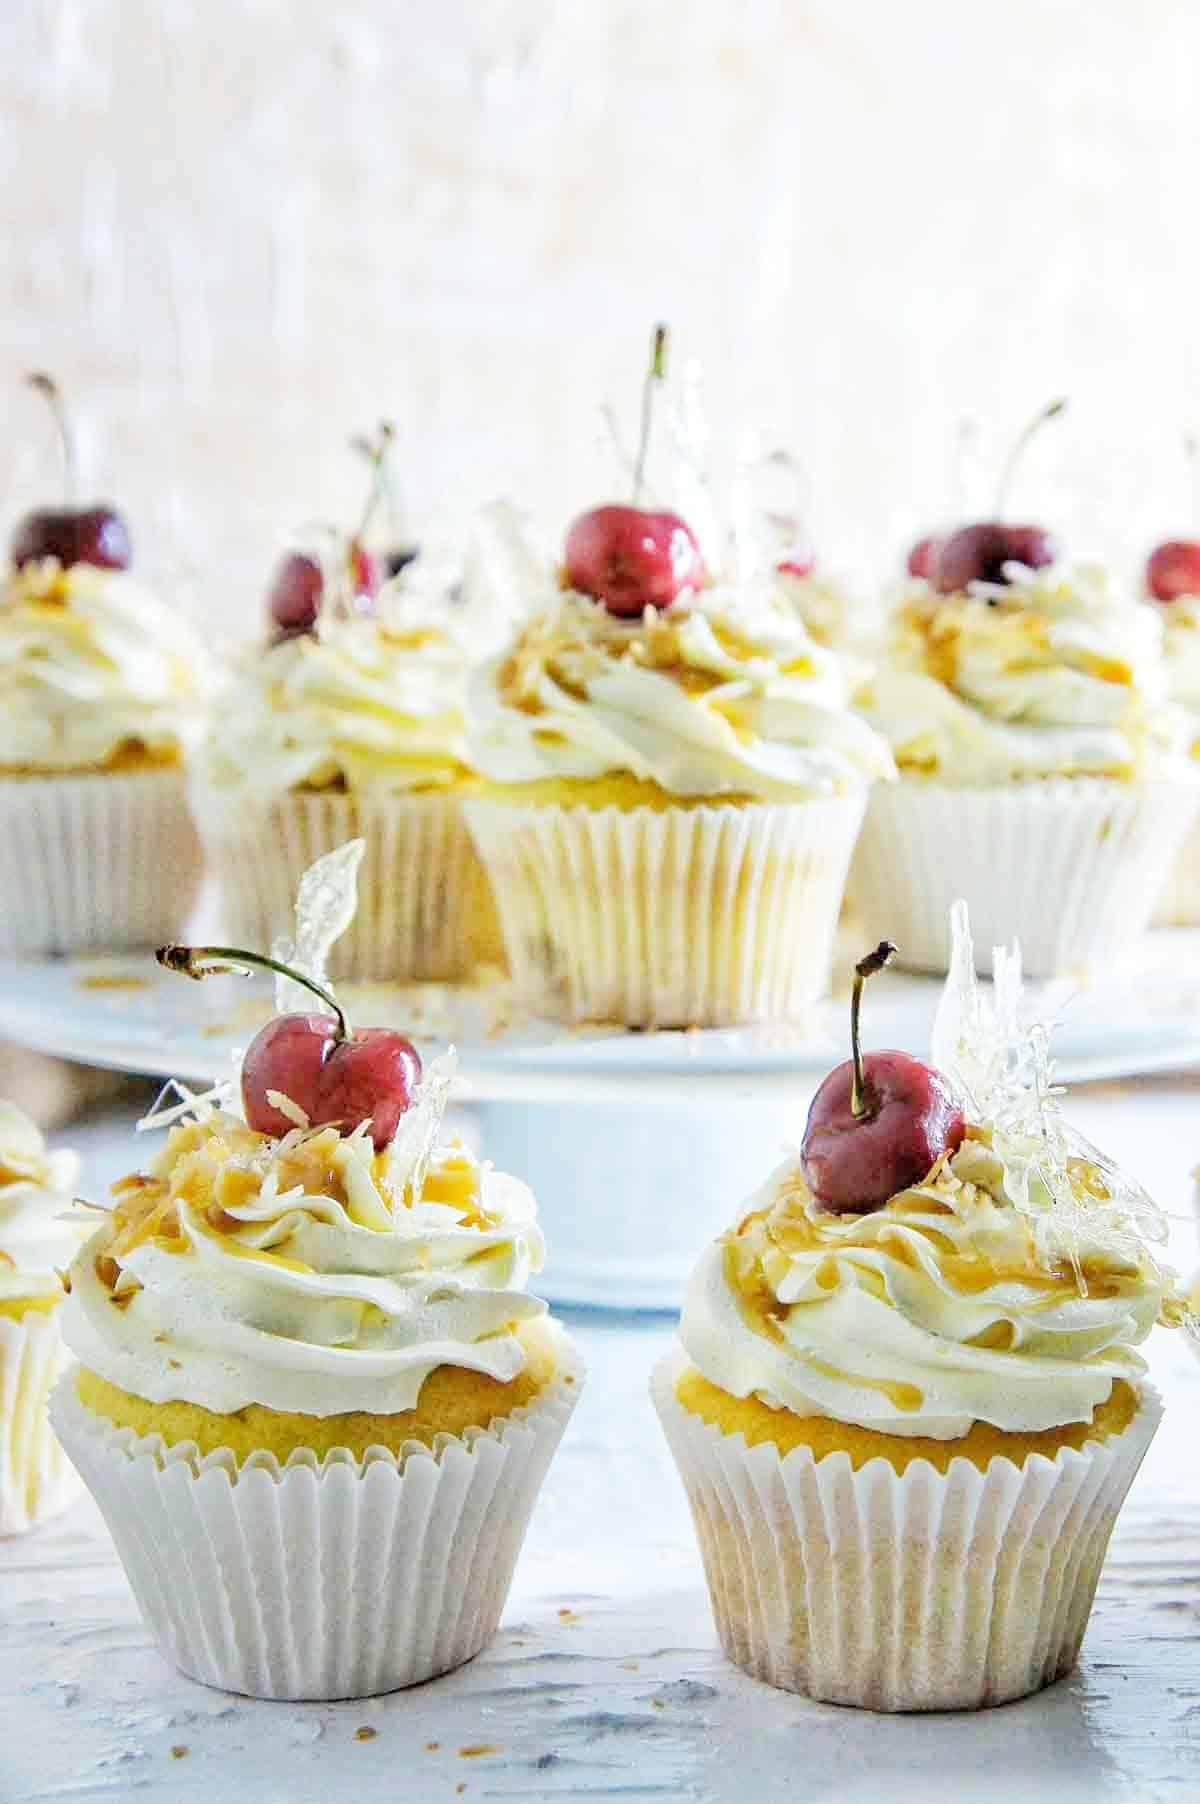 Mistletoe Cupcakes with cherries on top